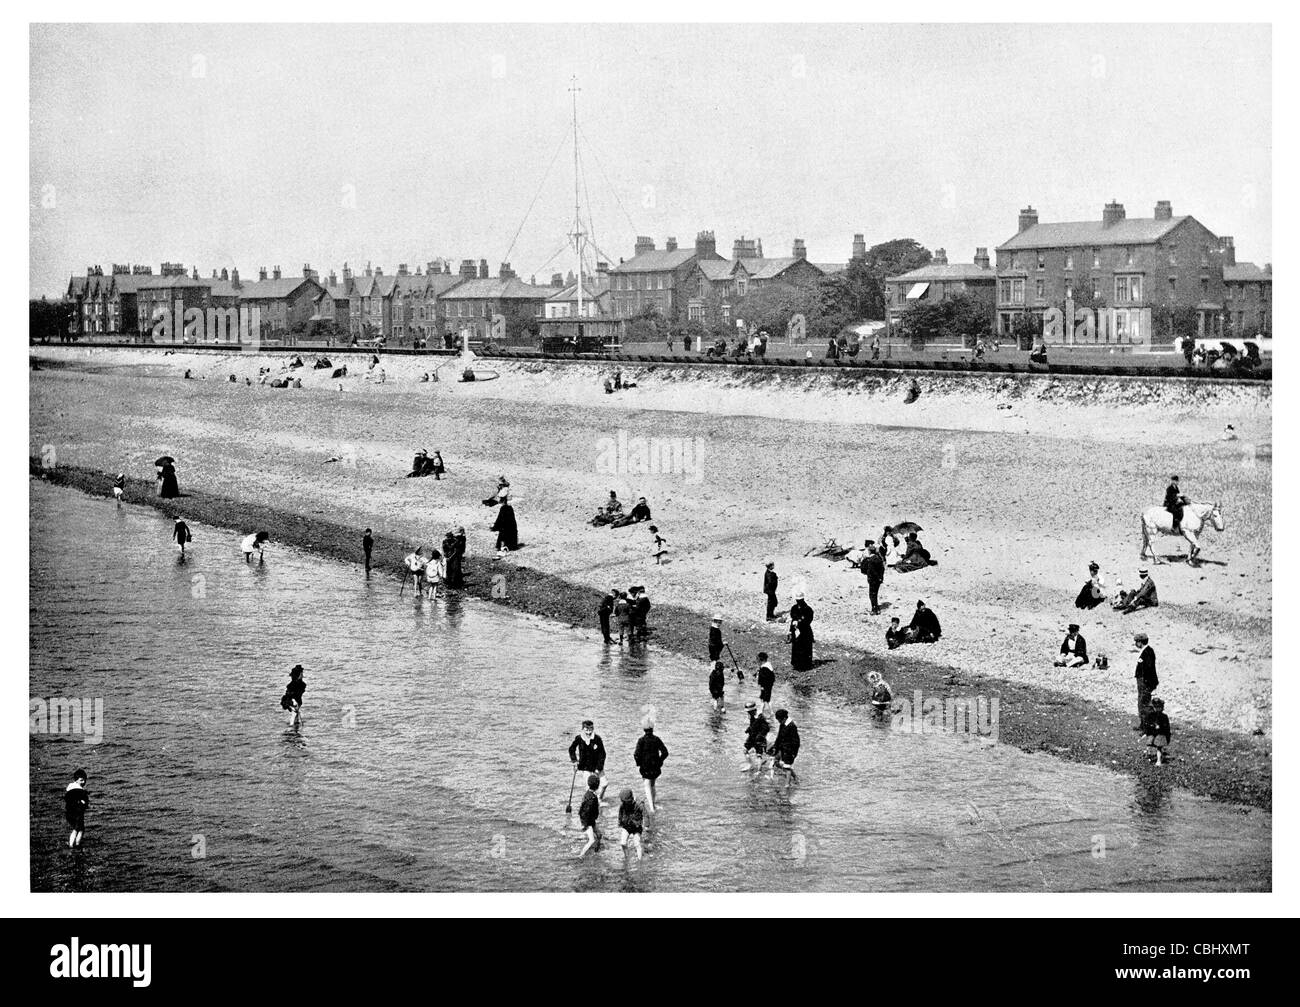 Lytham St Annes Lancashire England seaside resort promenade esplanade beach front bathing paddling swimming - Stock Image